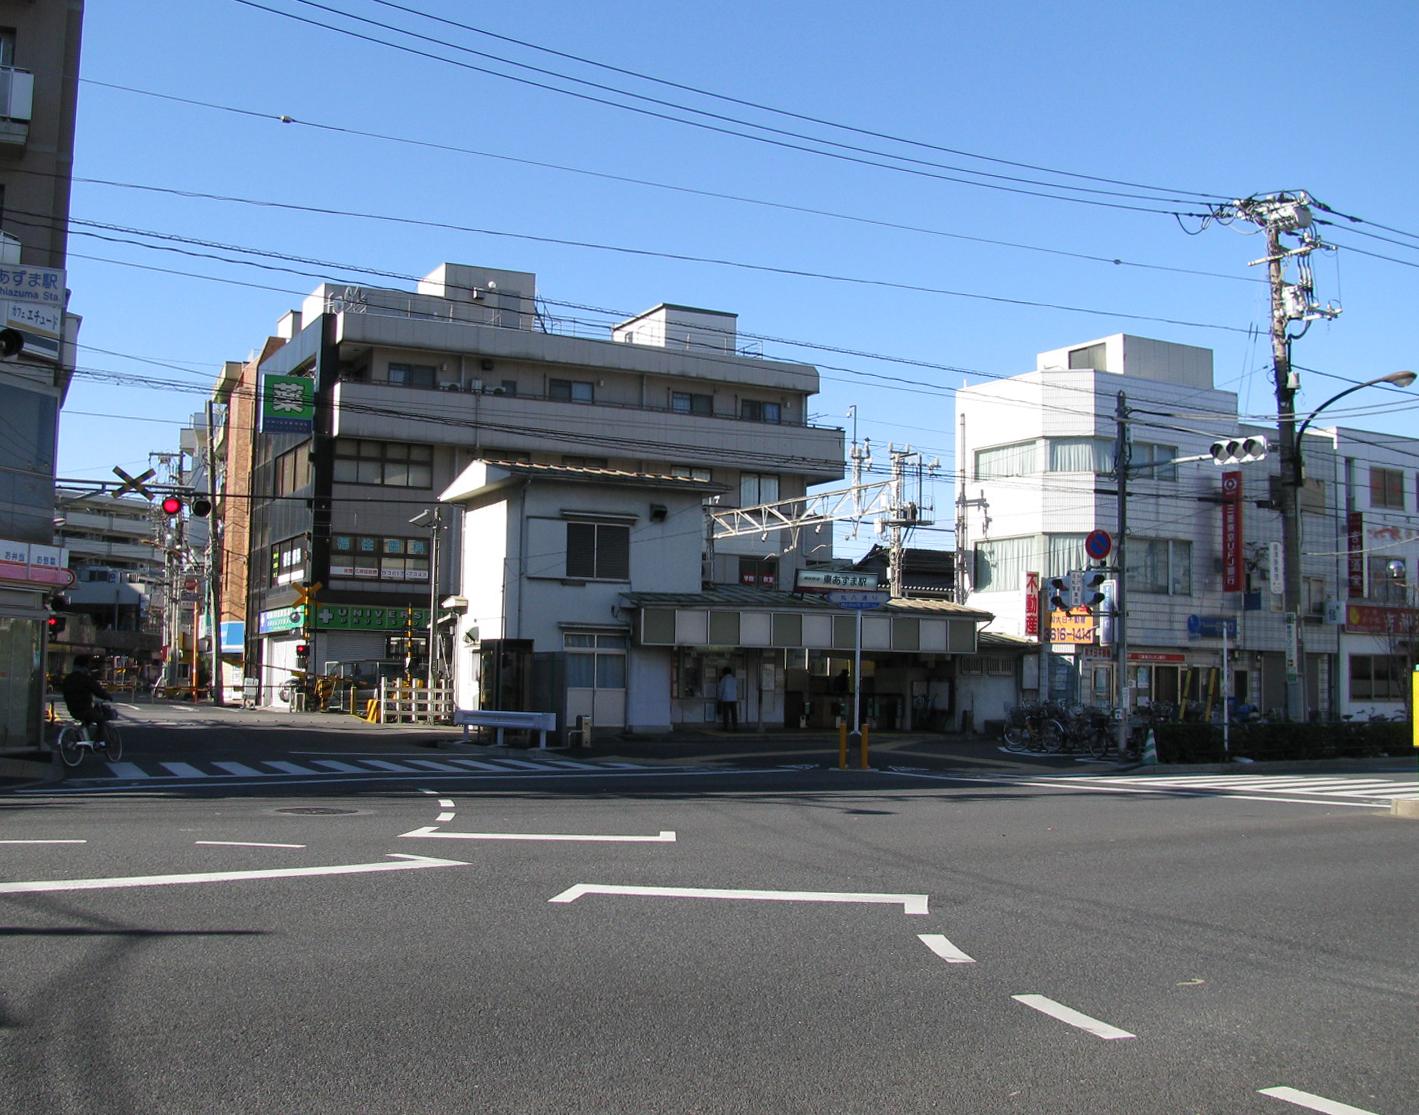 https://upload.wikimedia.org/wikipedia/commons/9/95/Tobu_Higashiazuma_sta_001.jpg